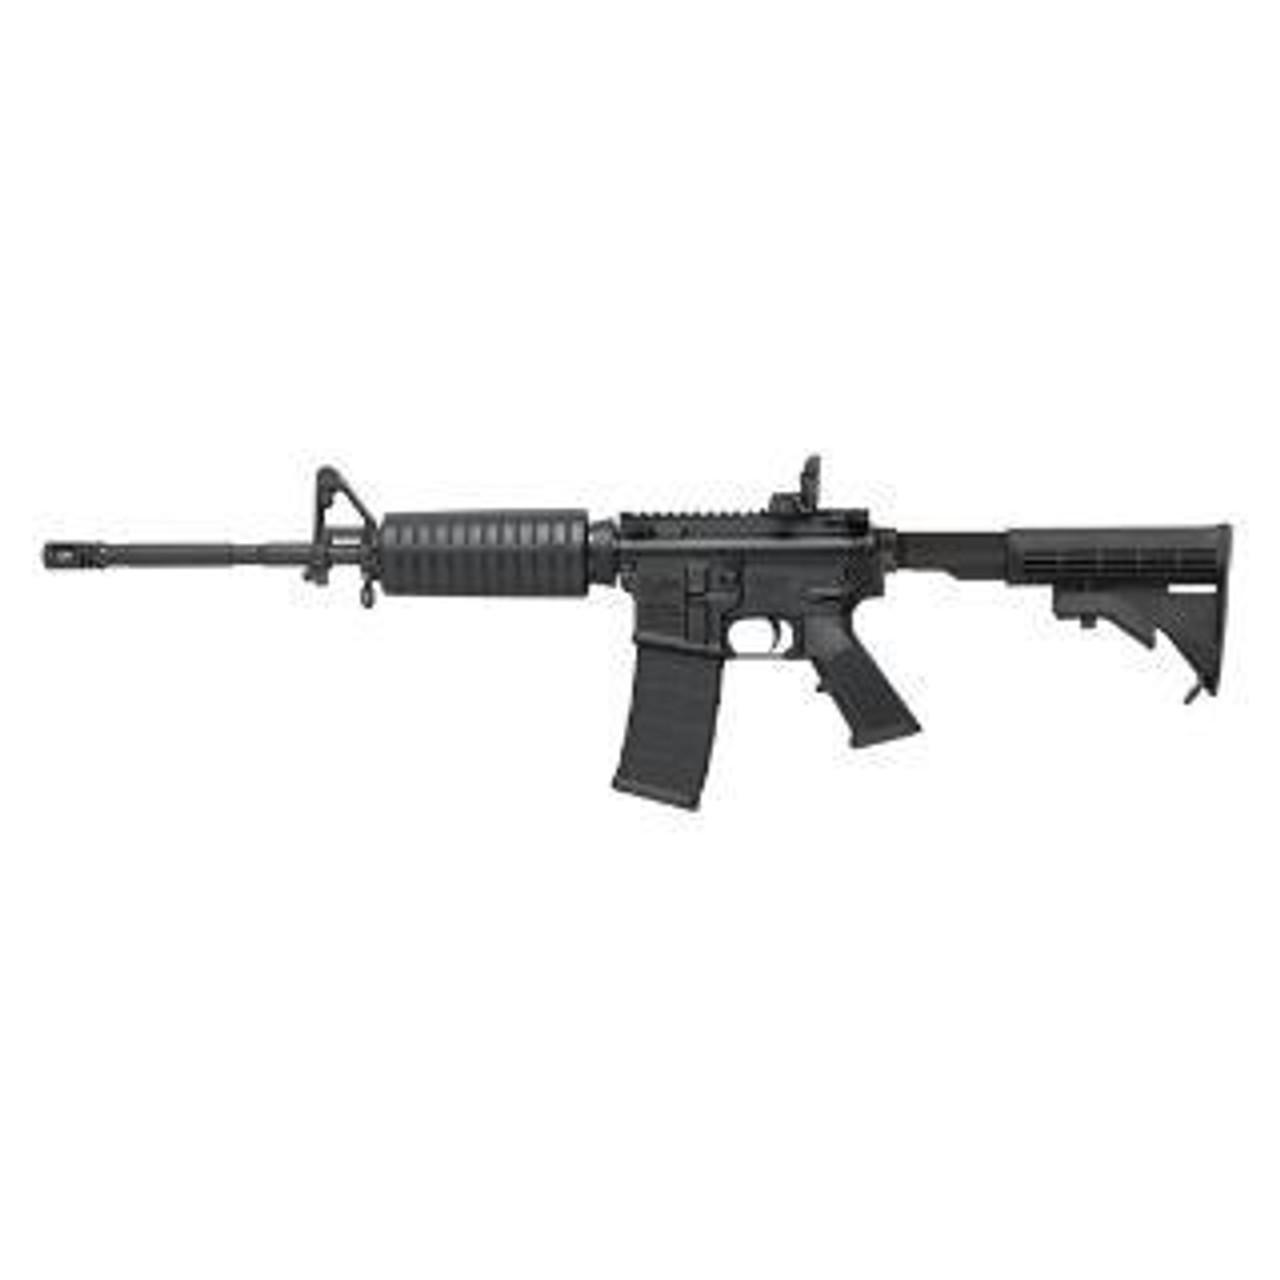 Colt LE6920 M4 Carbine CALIFORNIA LEGAL- 5.56